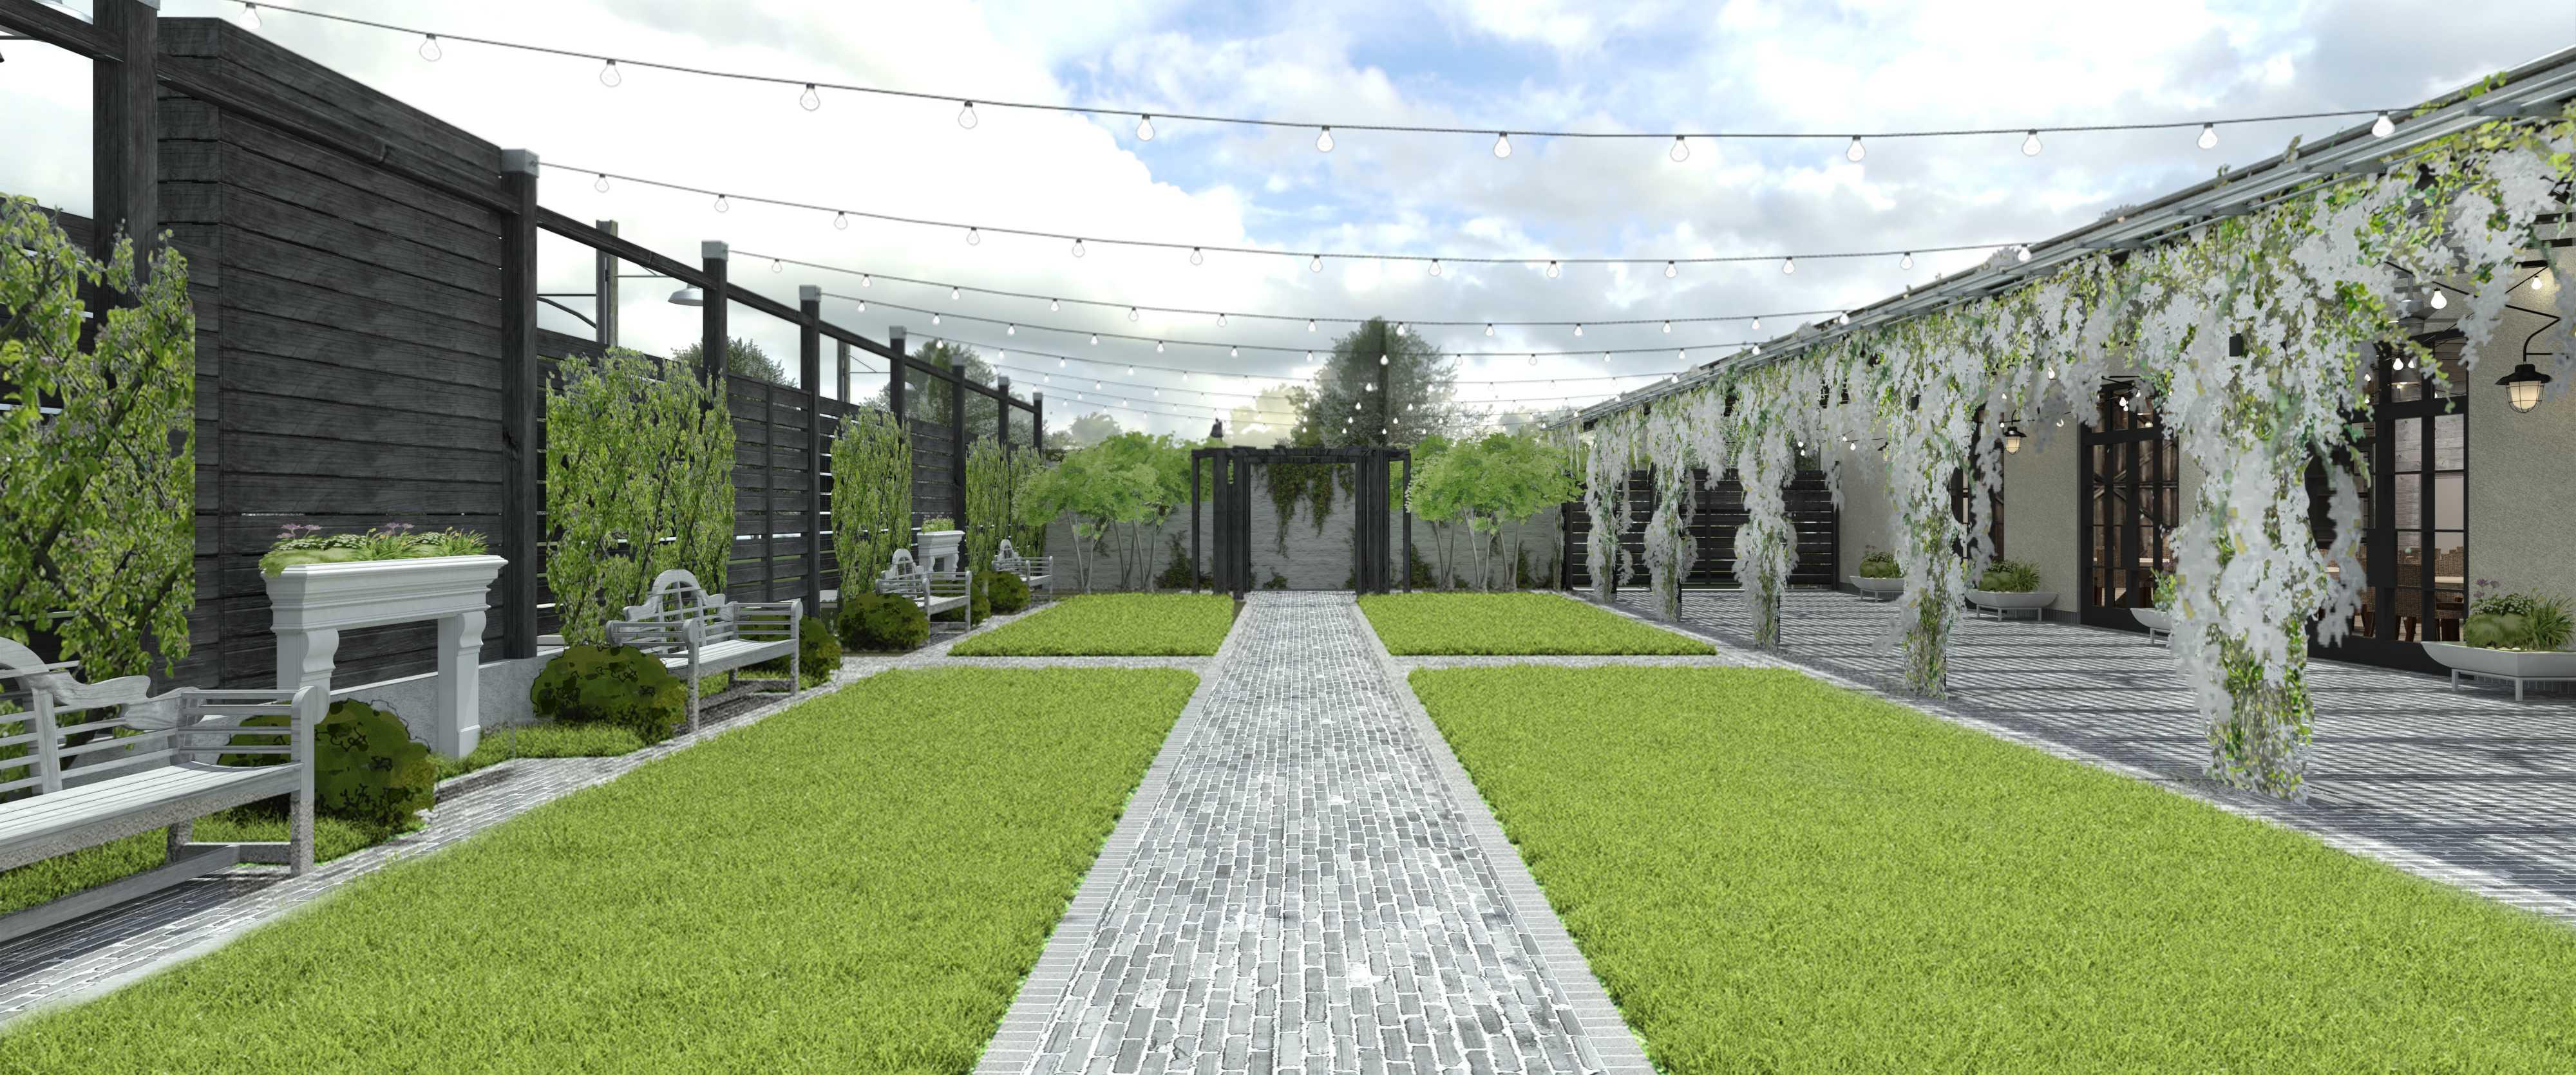 Terrain Gardens at Devon Yard to Offer Impressive Venue for Weddings